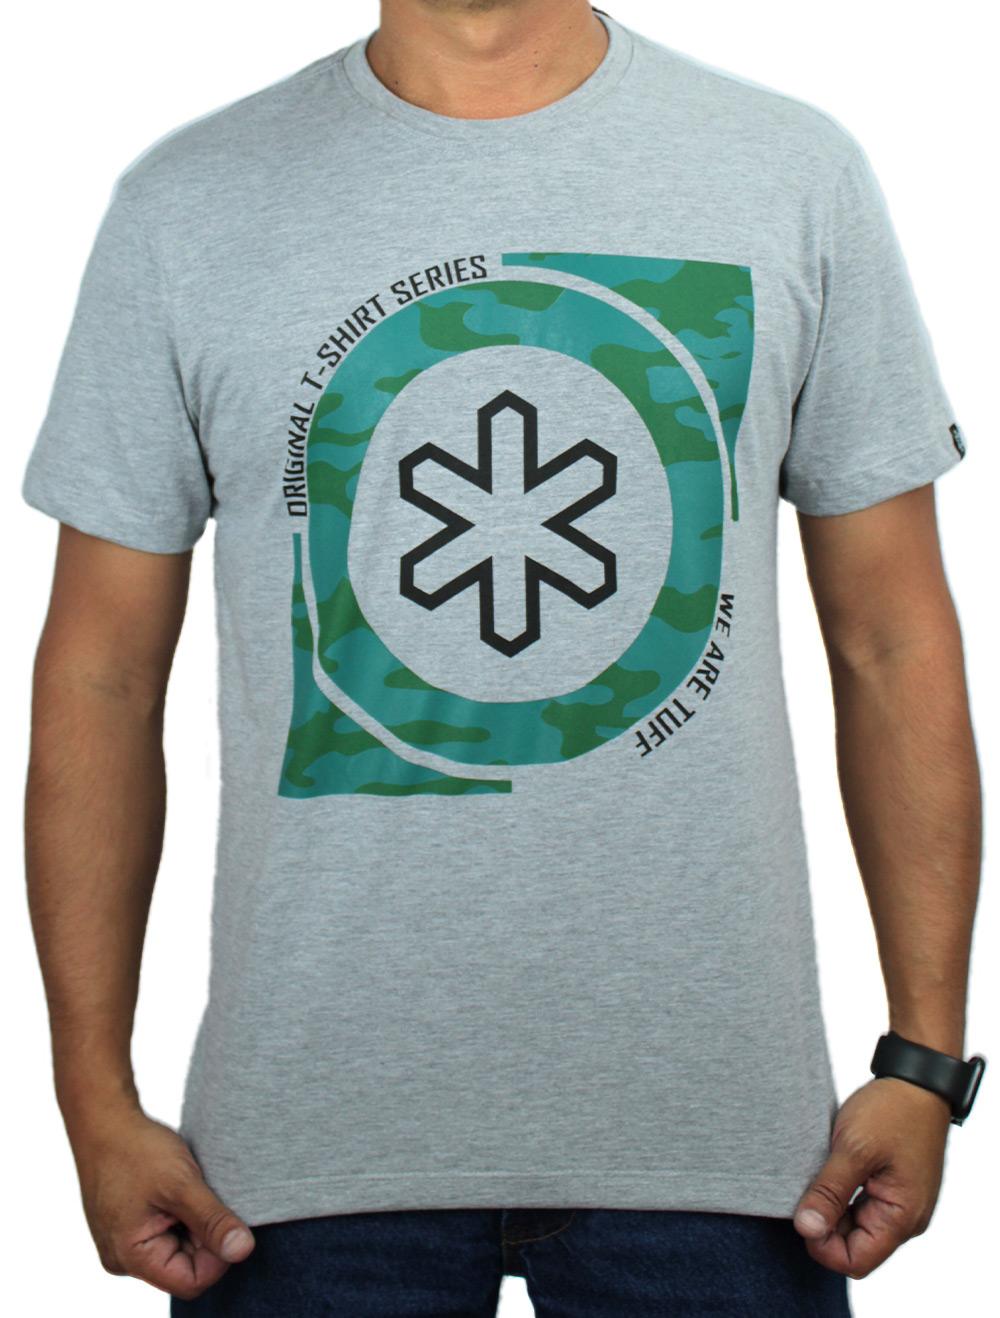 Camiseta Masculina Mescla Cinza Silk Camuflado